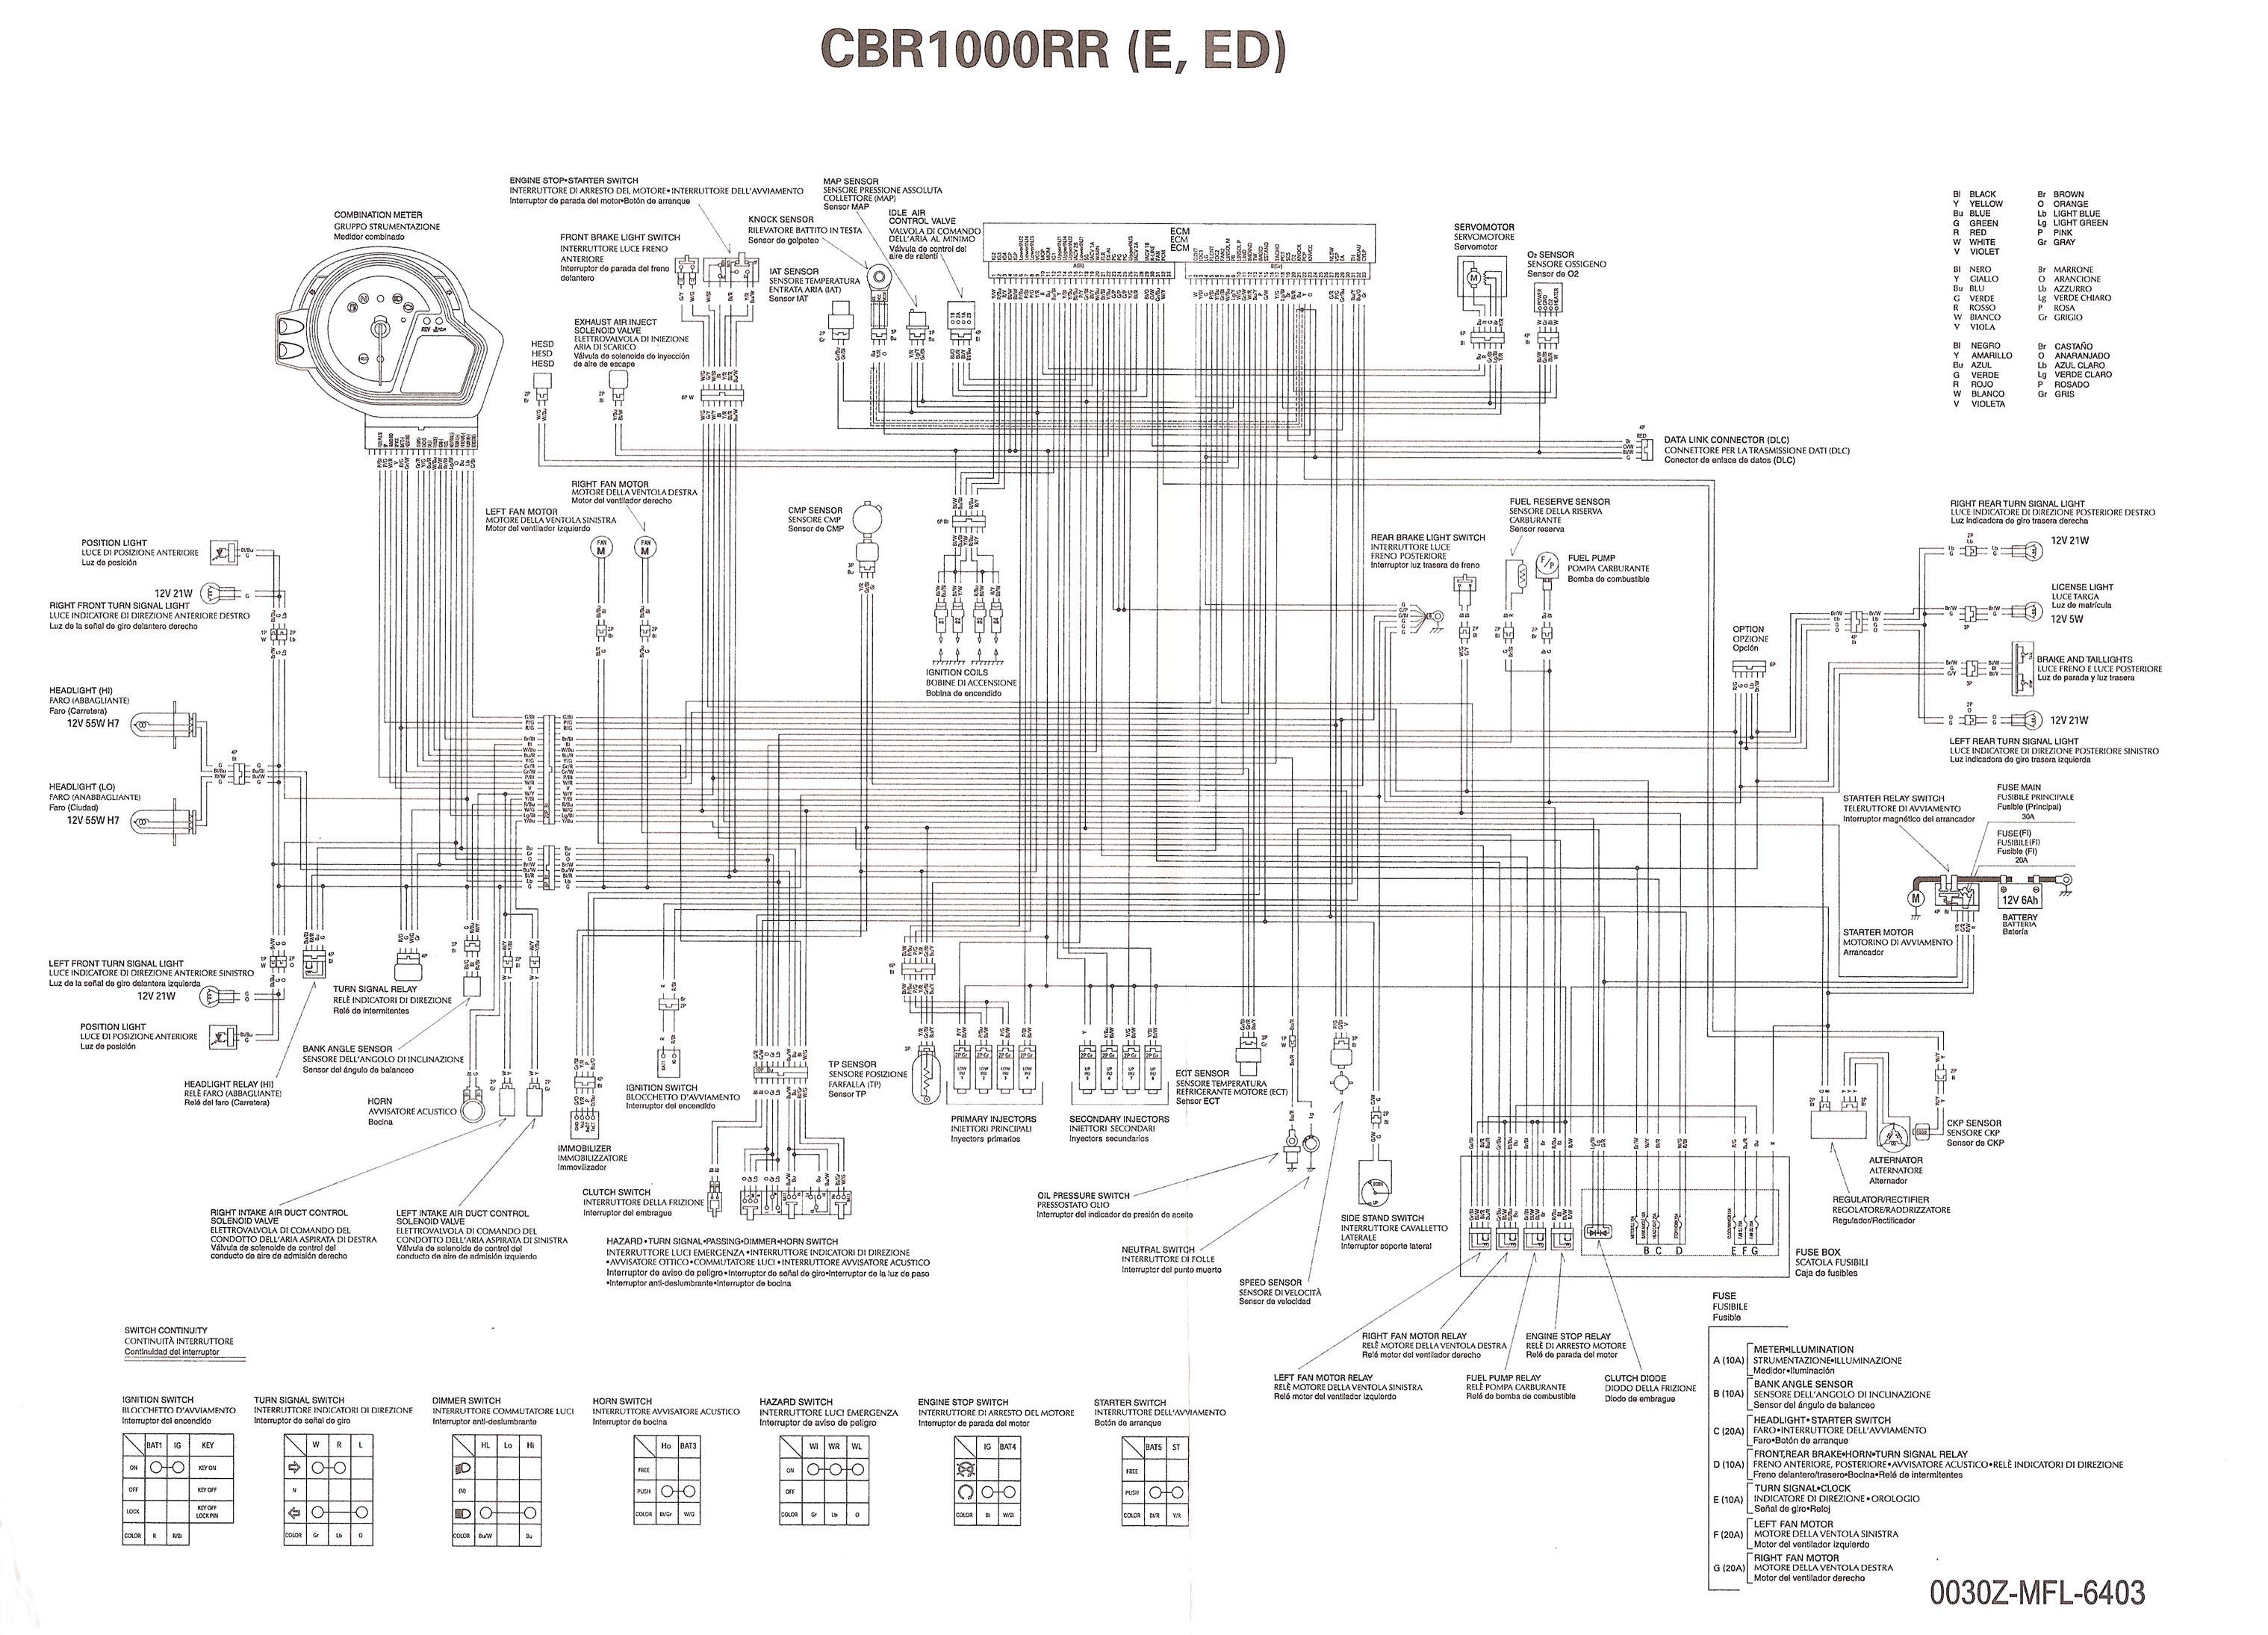 2013 honda cbr1000rr wiring diagram